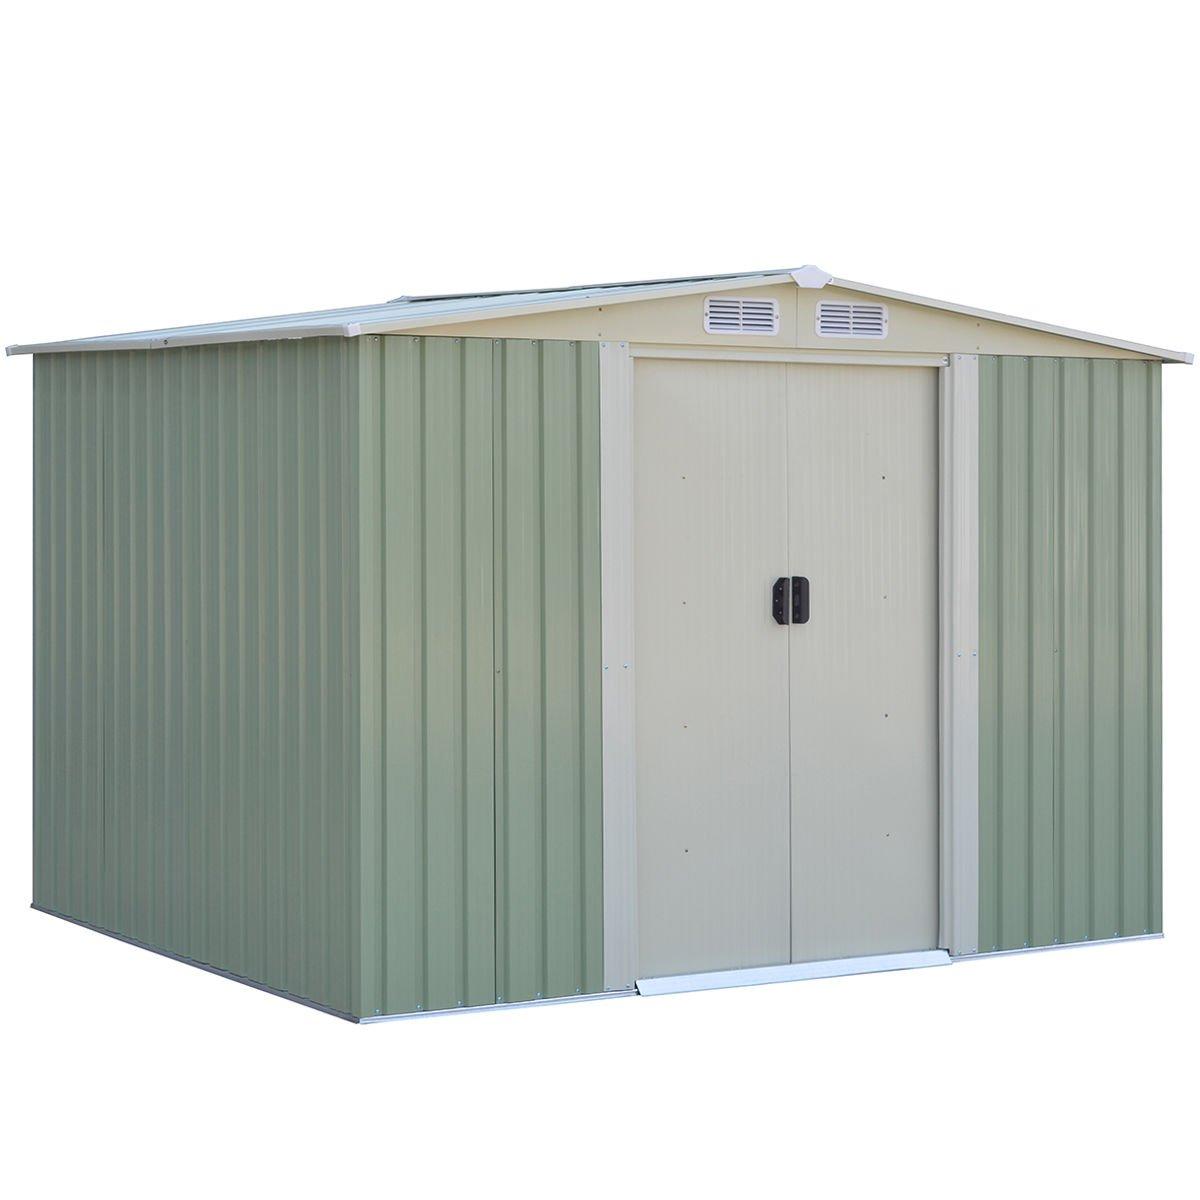 Goplus Galvanized Steel Outdoor Garden Storage Shed 6 x 8 Ft Heavy Duty Tool House W/ Sliding Door (Green)